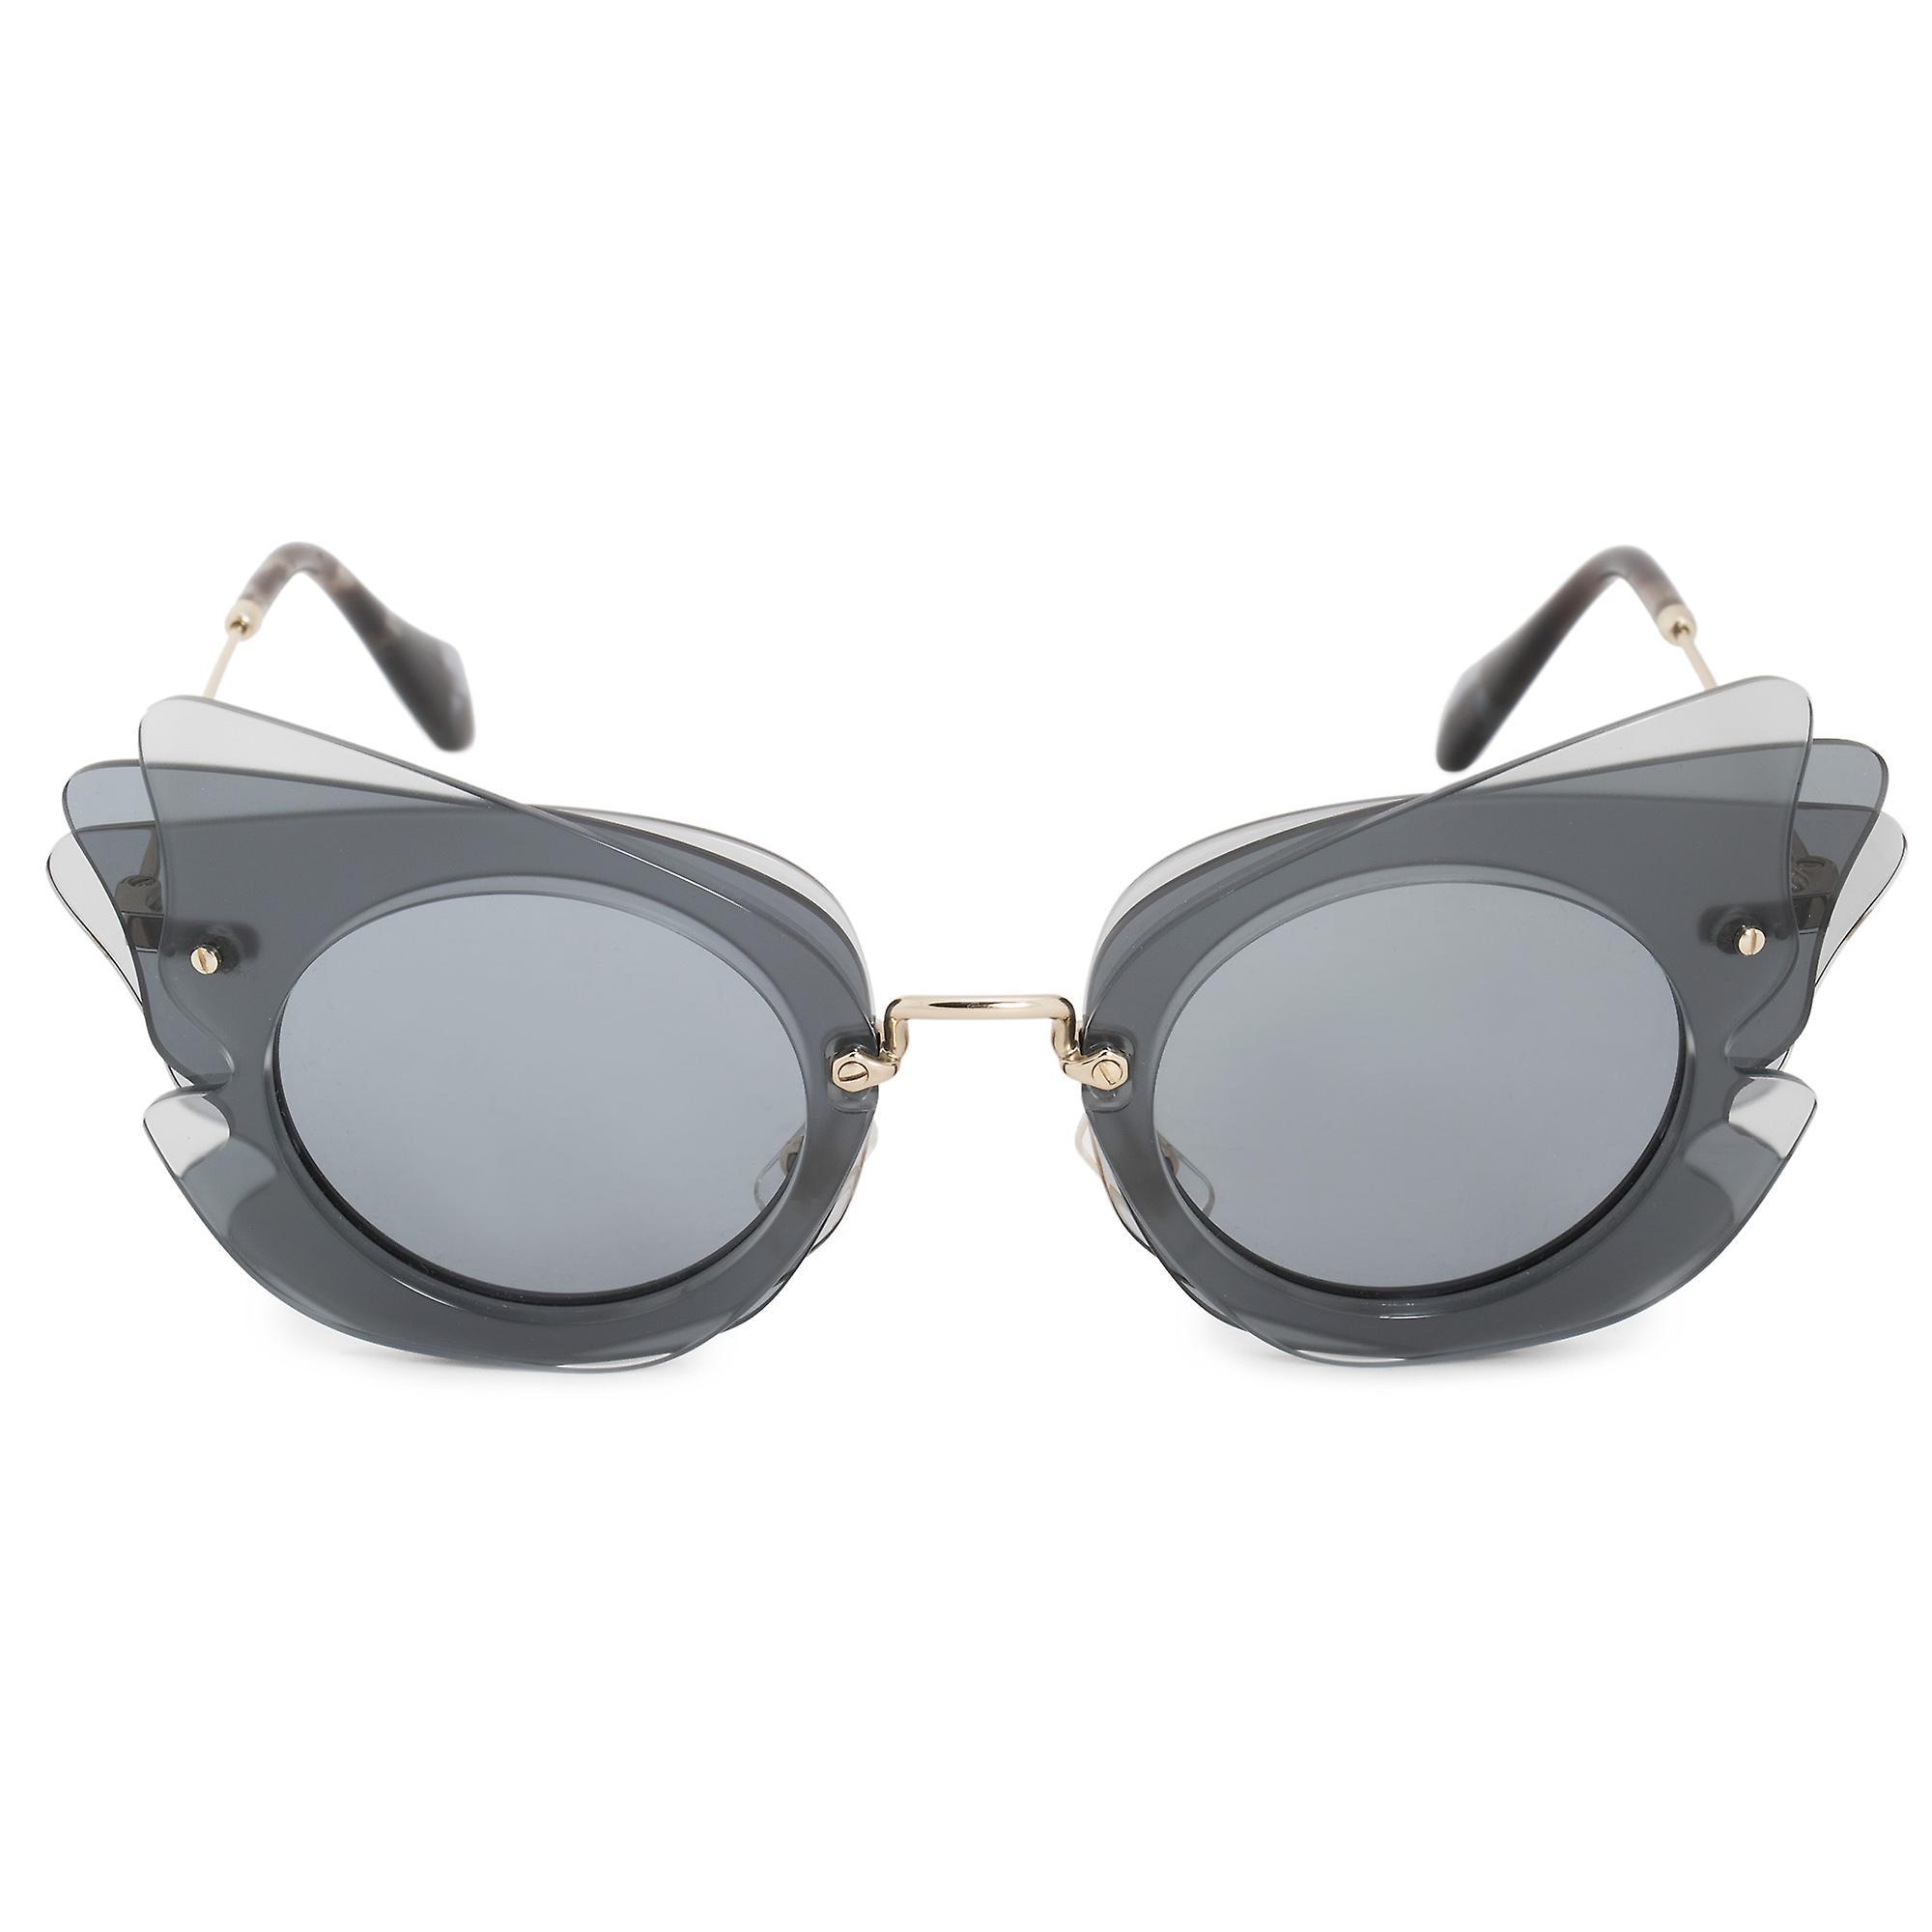 Miu Miu Butterfly Sunglasses SMU02SS VA43C2 63